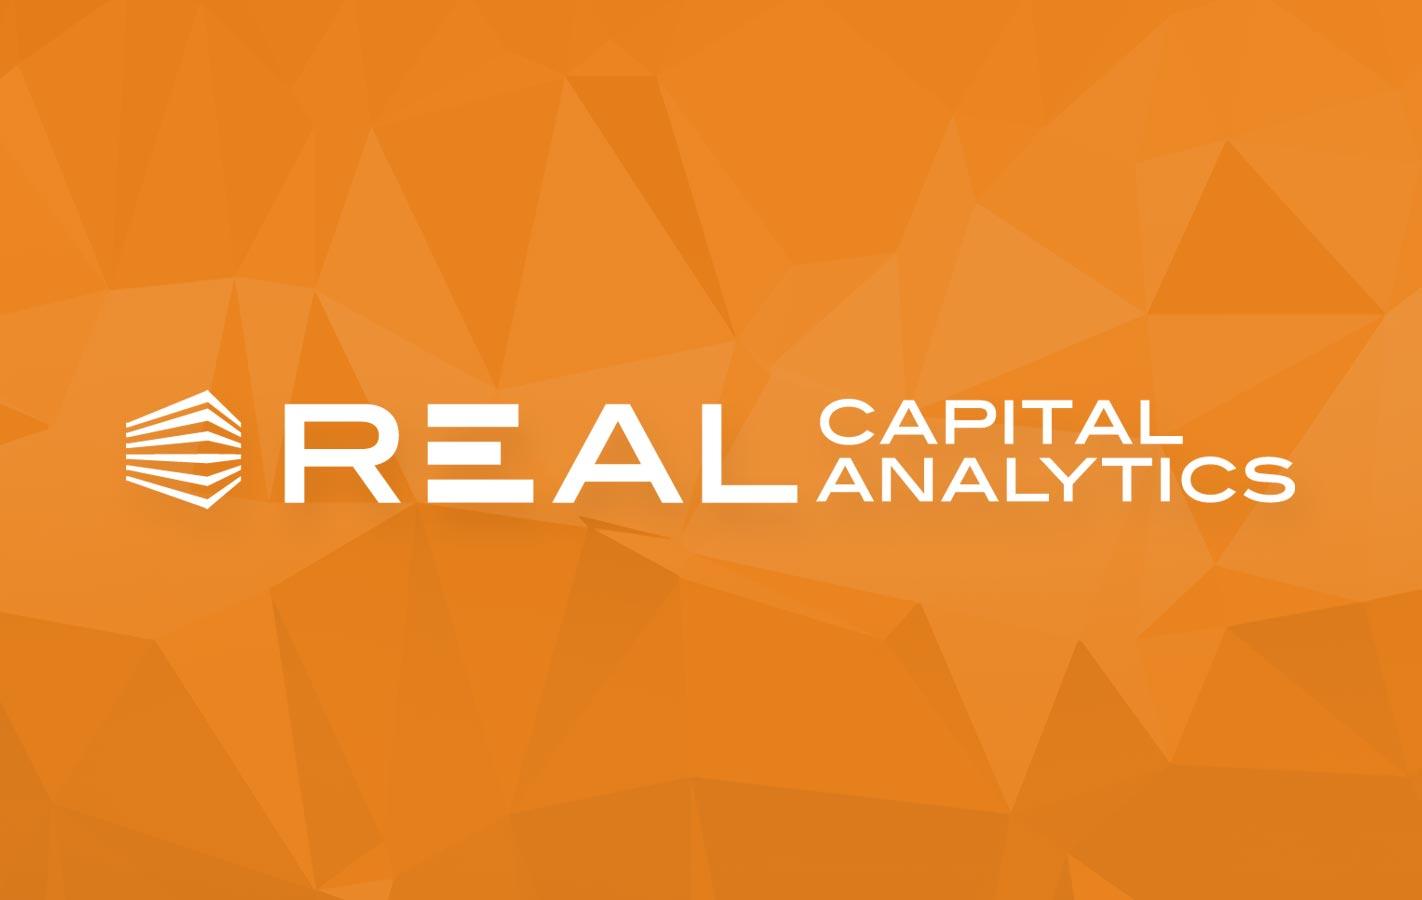 Real Capital Analytics